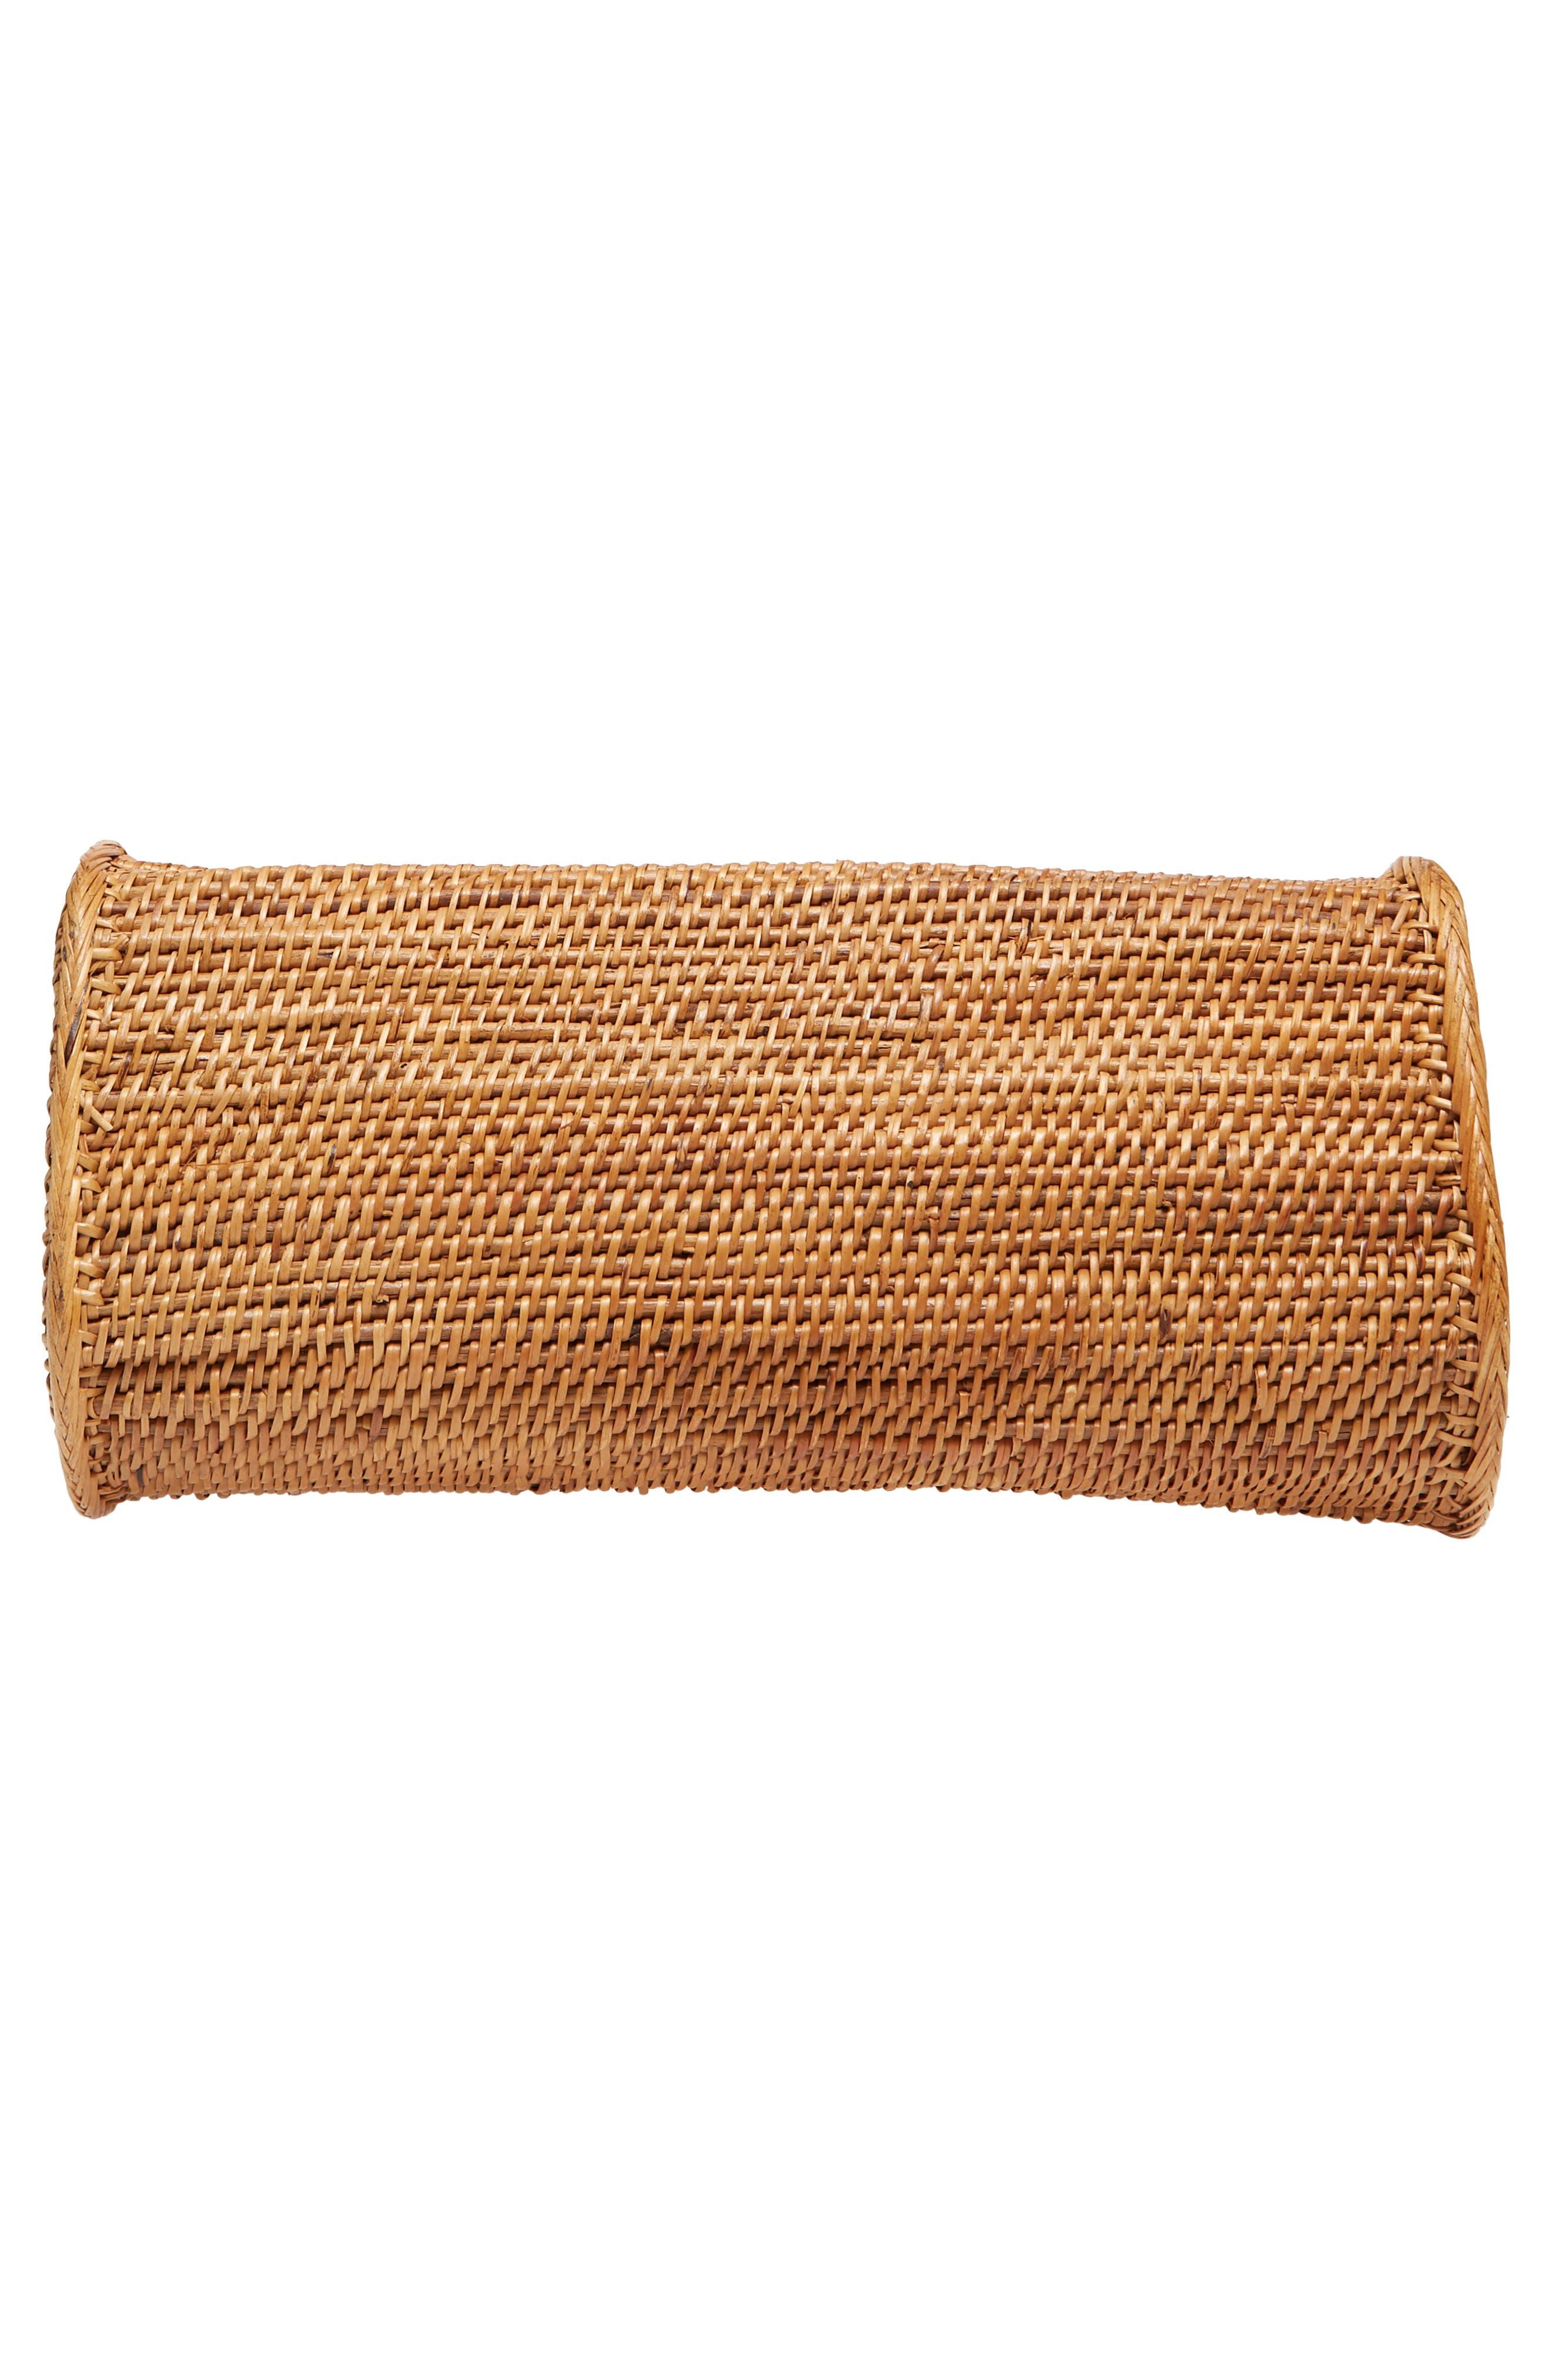 Woven Rattan Handbag,                             Alternate thumbnail 6, color,                             230